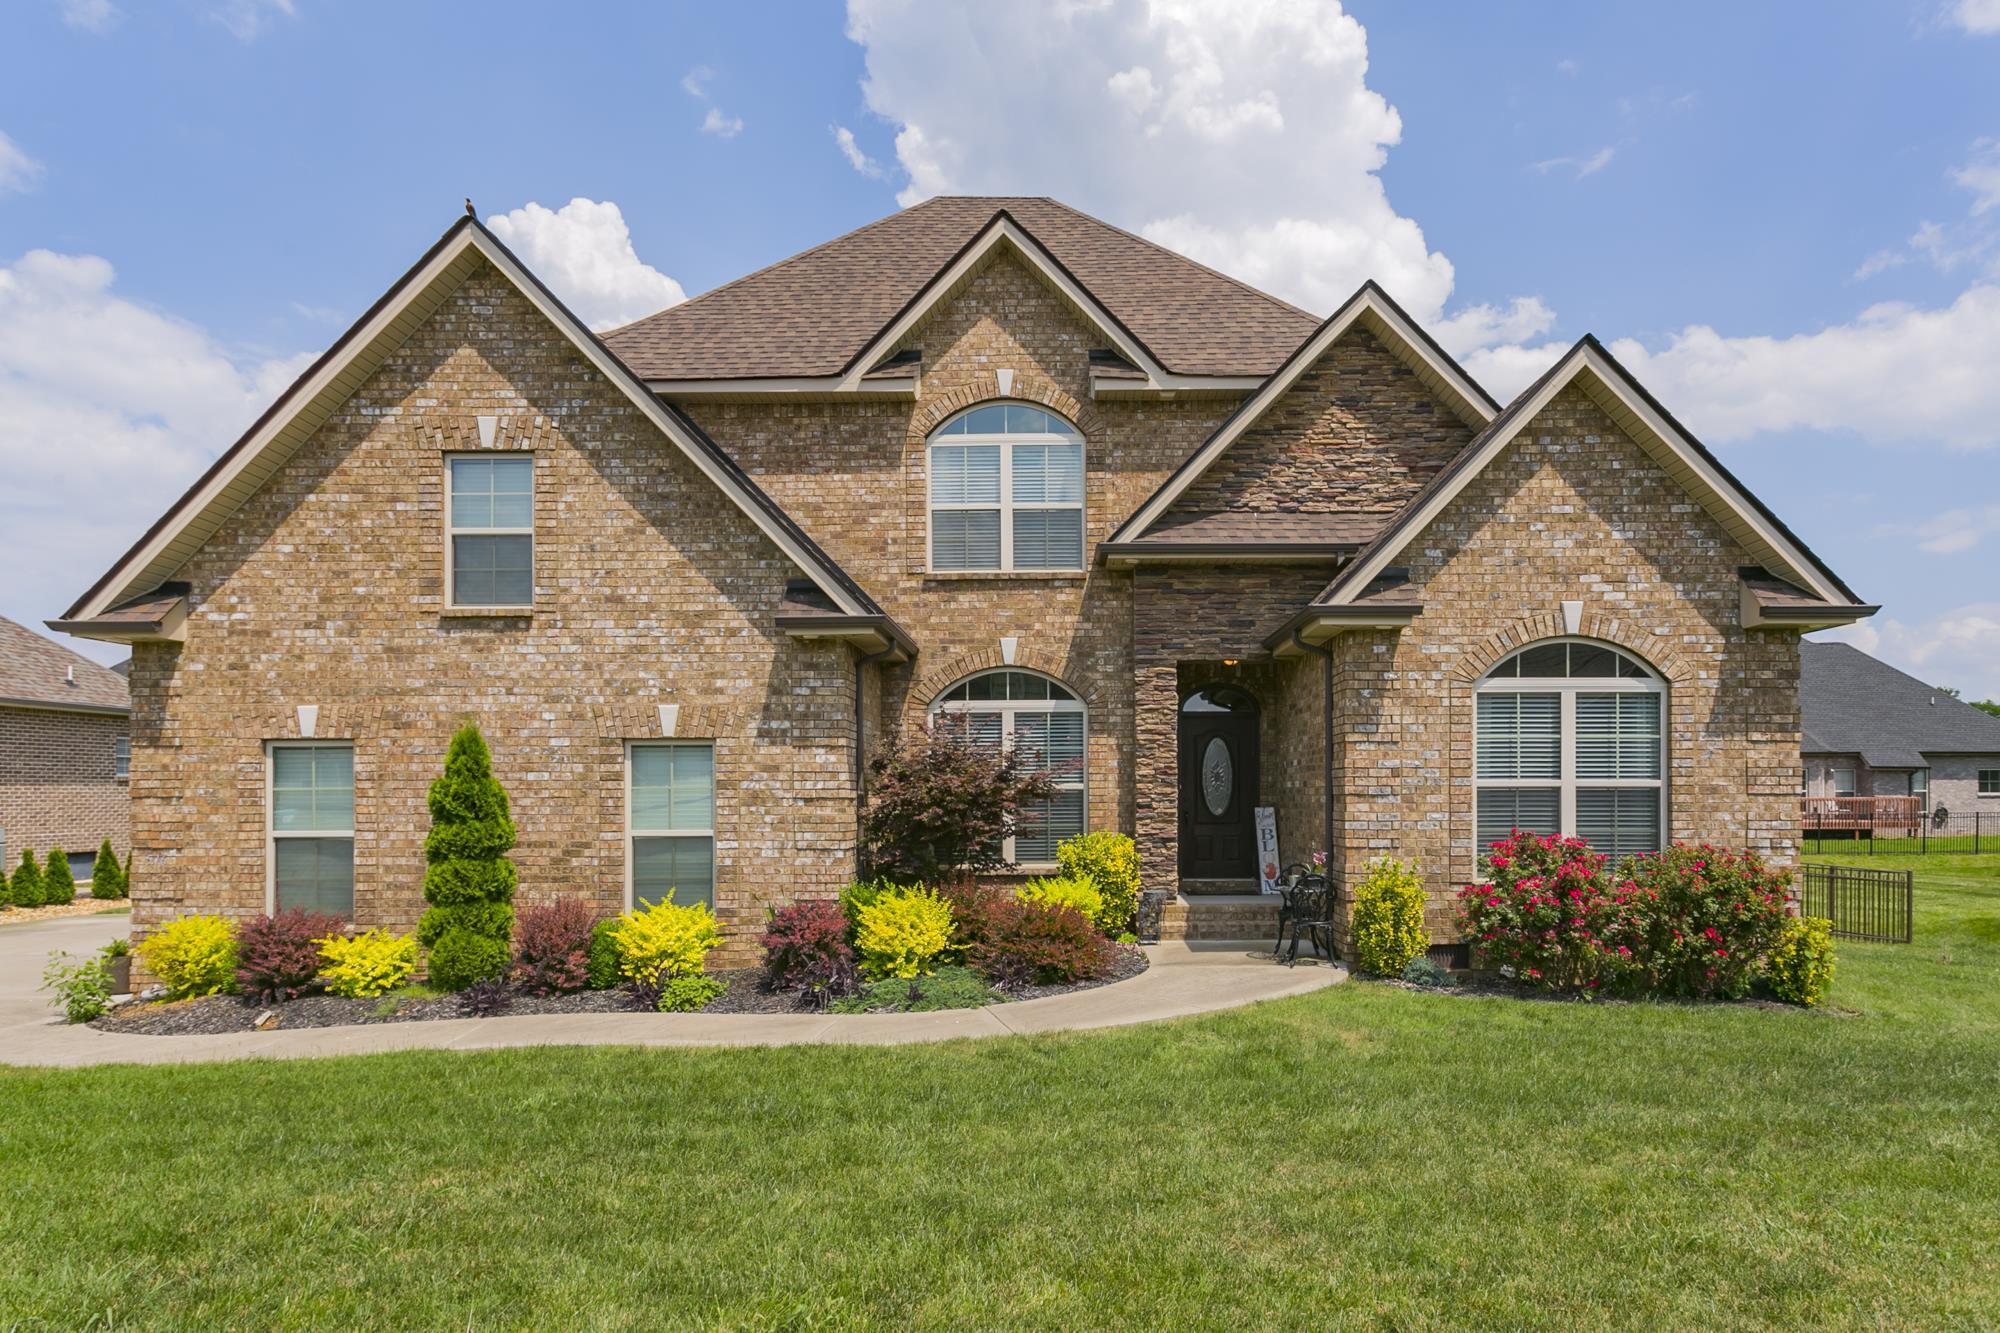 516 Piccadilly Dr, Murfreesboro, TN 37128 - Murfreesboro, TN real estate listing